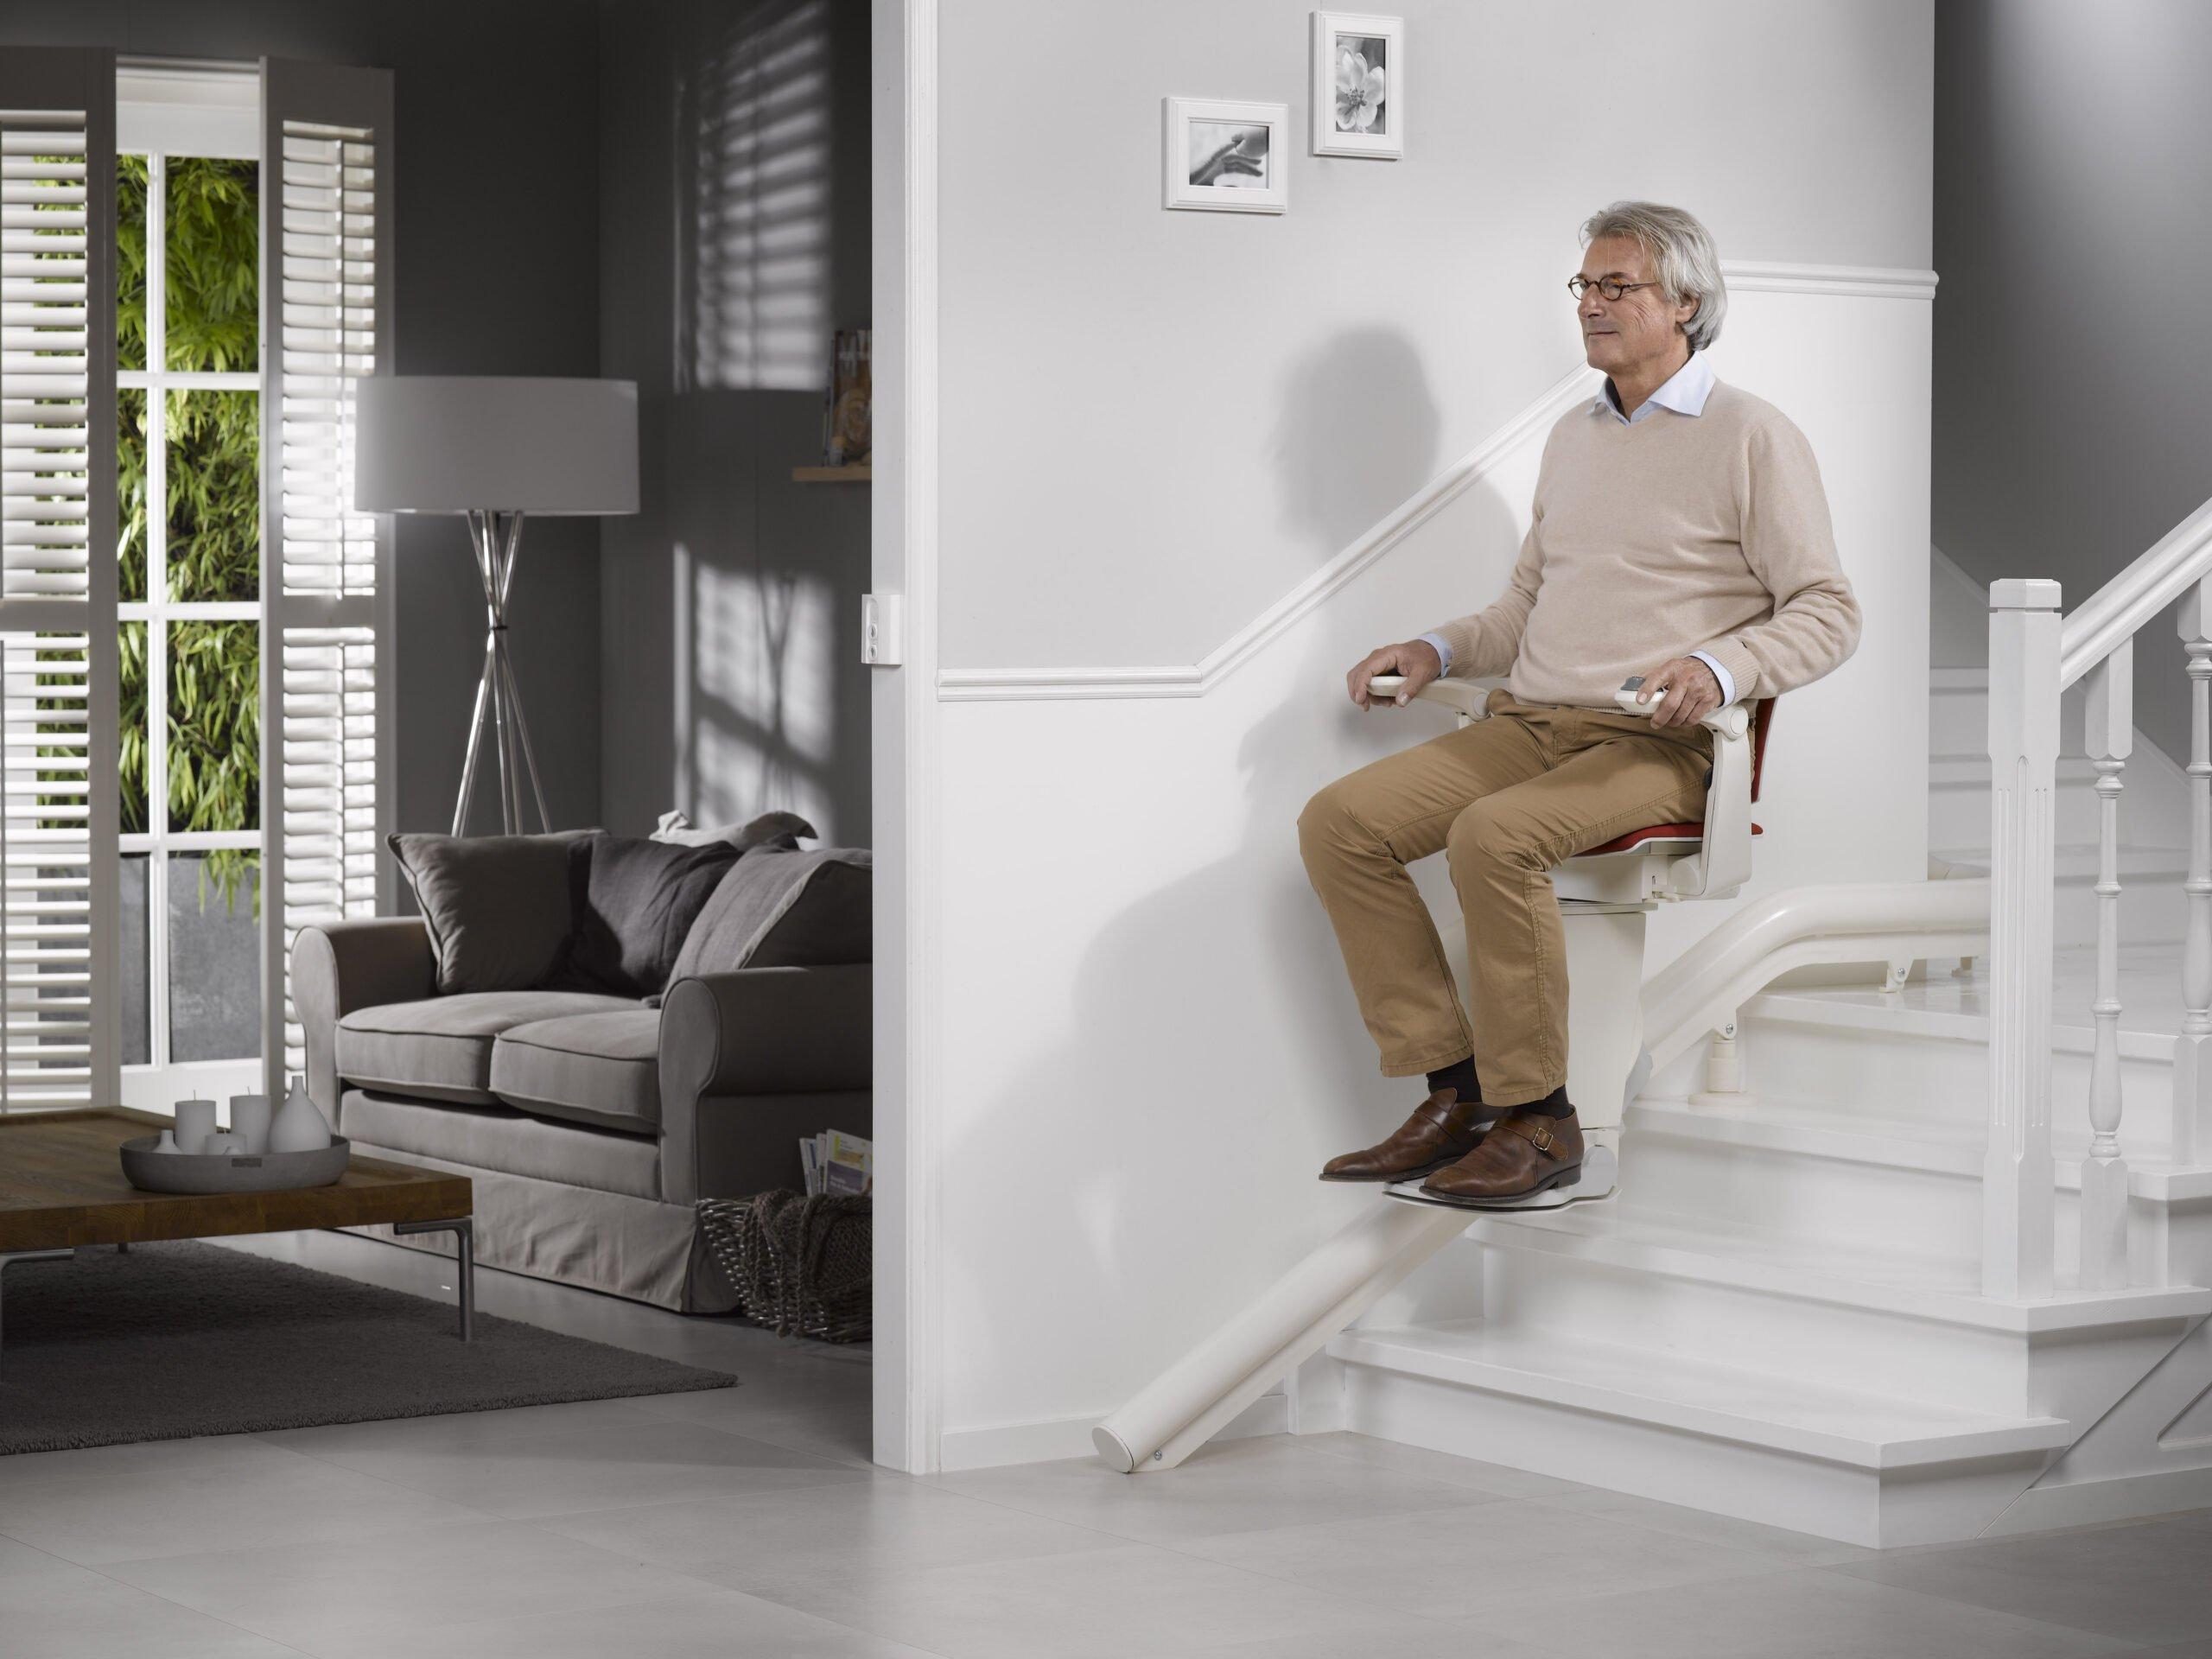 Man on chair lift